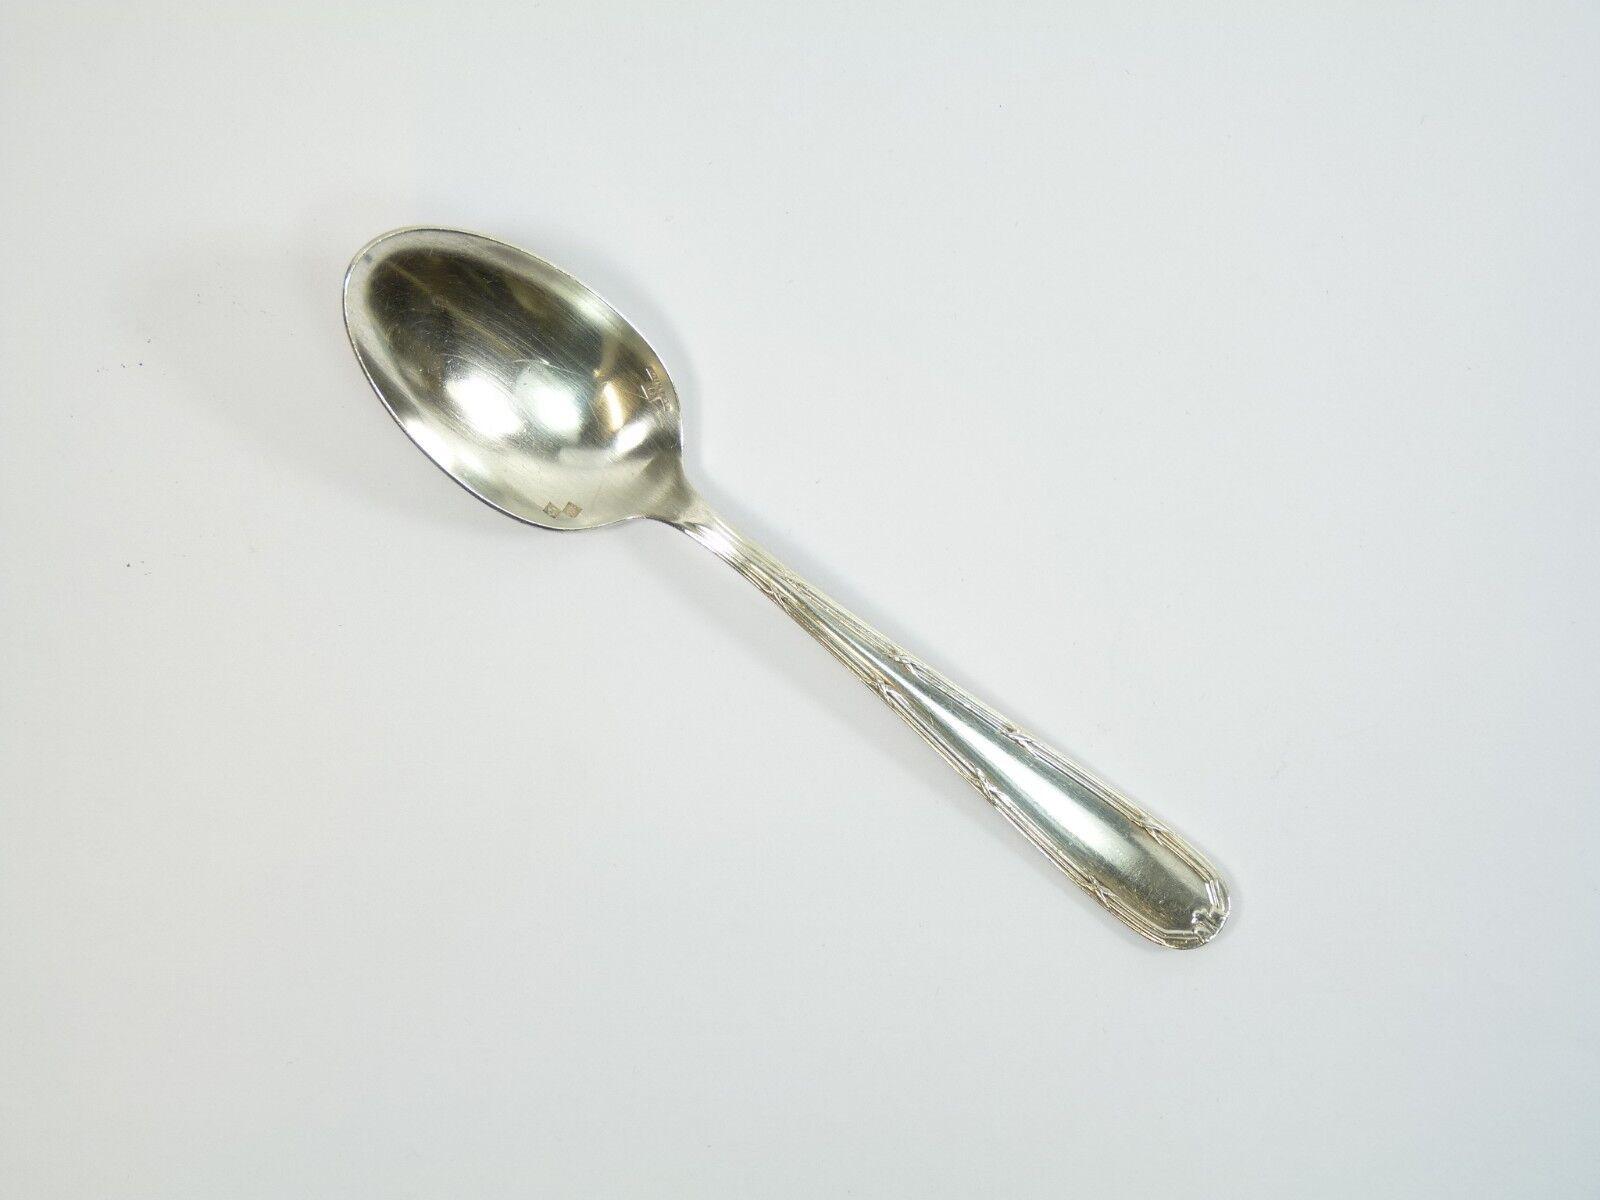 "BERAIN // MAROT CHRISTOFLE Cutlery Table Spoon // Spoons 8/"""